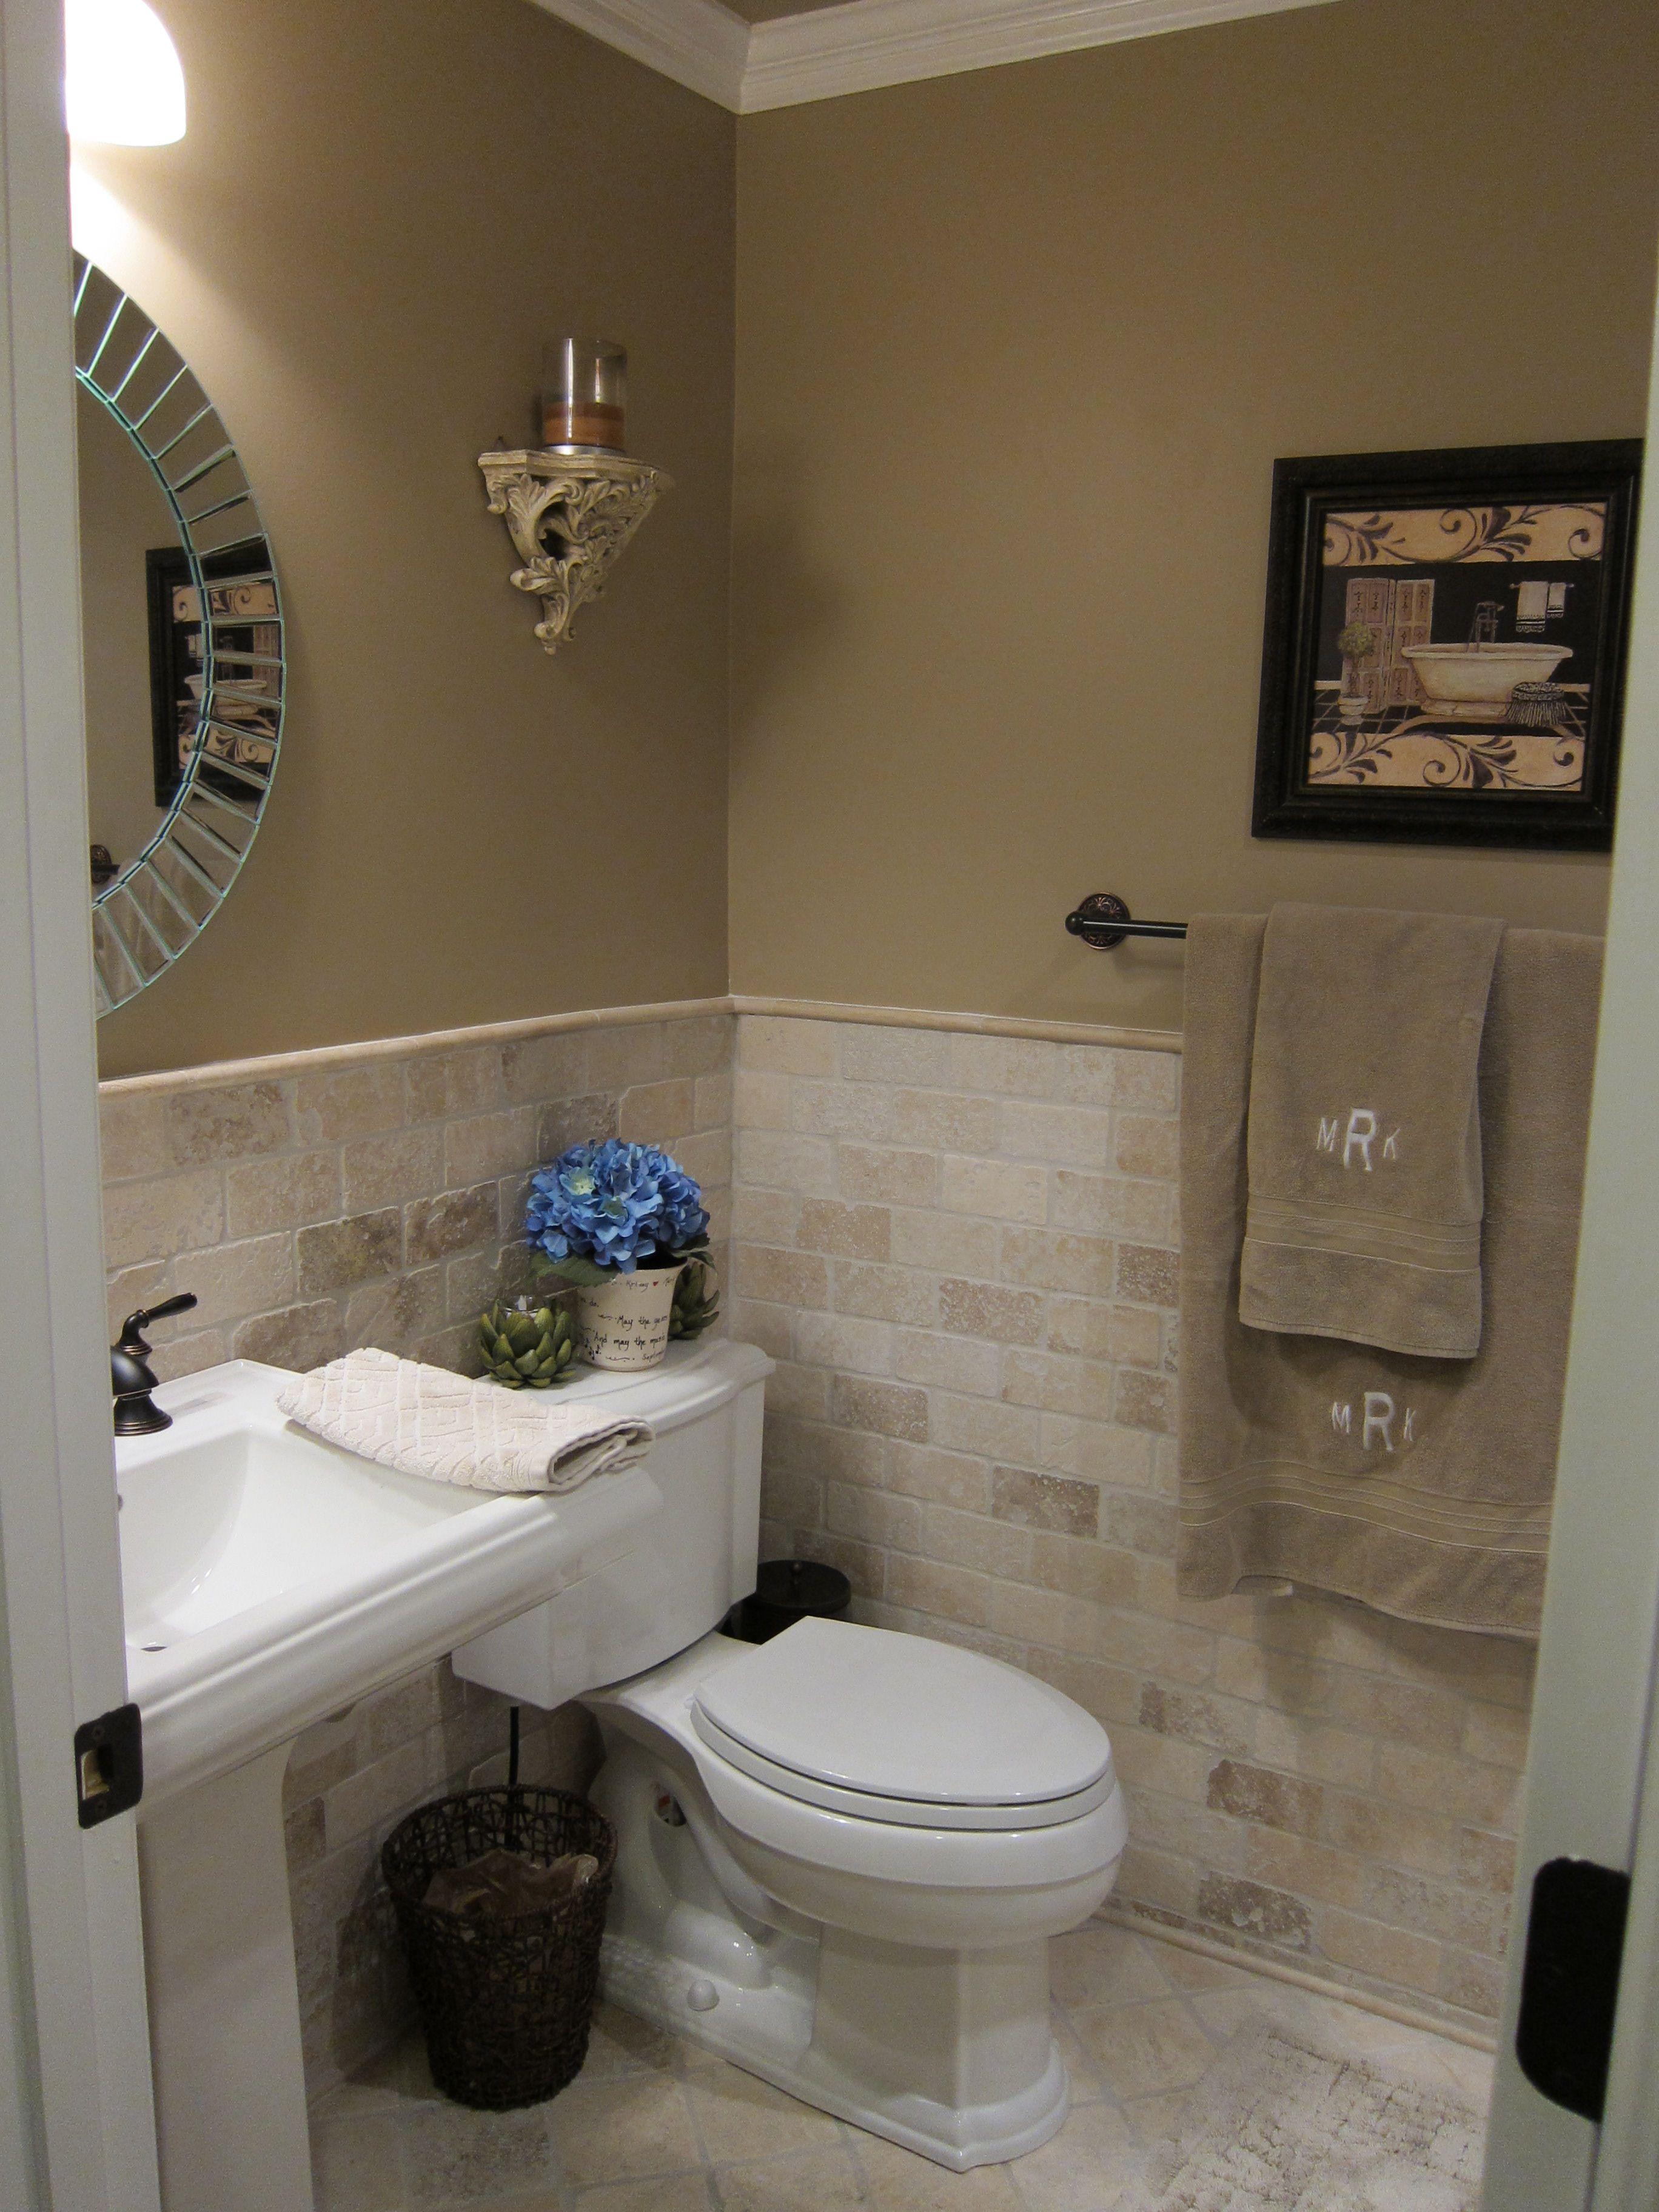 10 Beautiful Half Bathroom Ideas For Your Home Small Half